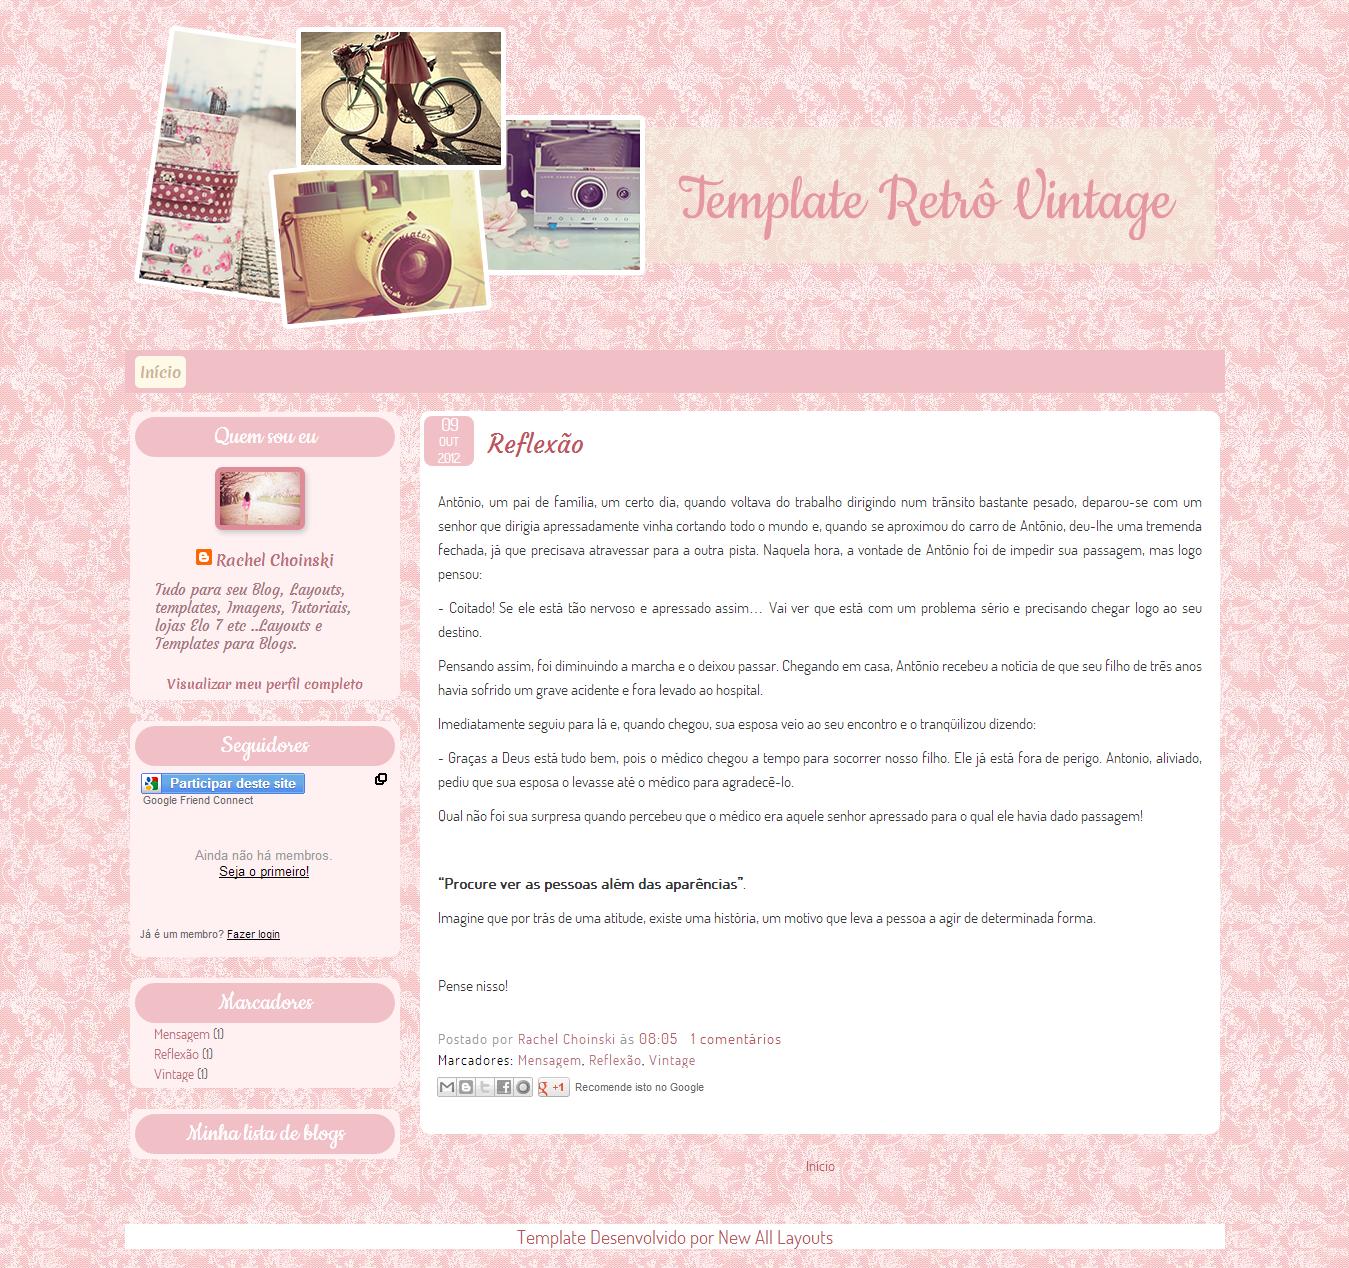 Templates By Erika: Templates Free de Outras Web